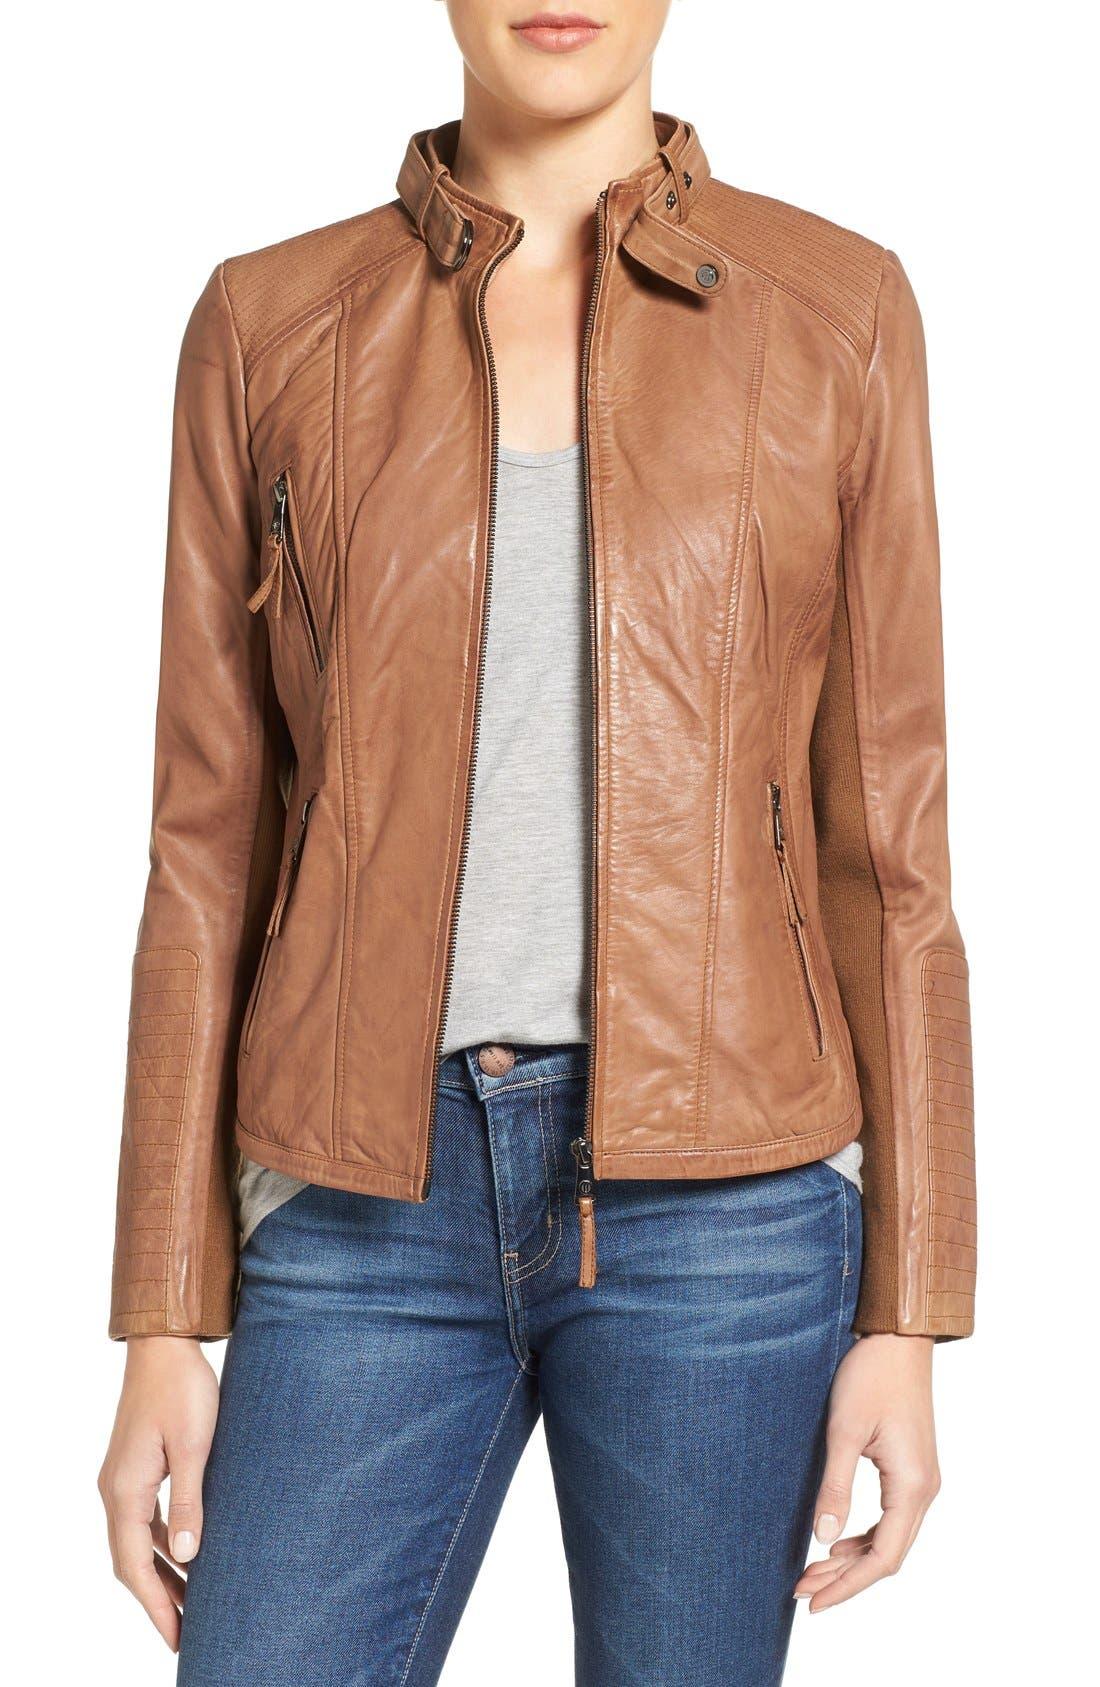 Alternate Image 1 Selected - Bernardo Zip Front Leather Biker Jacket (Regular & Petite)